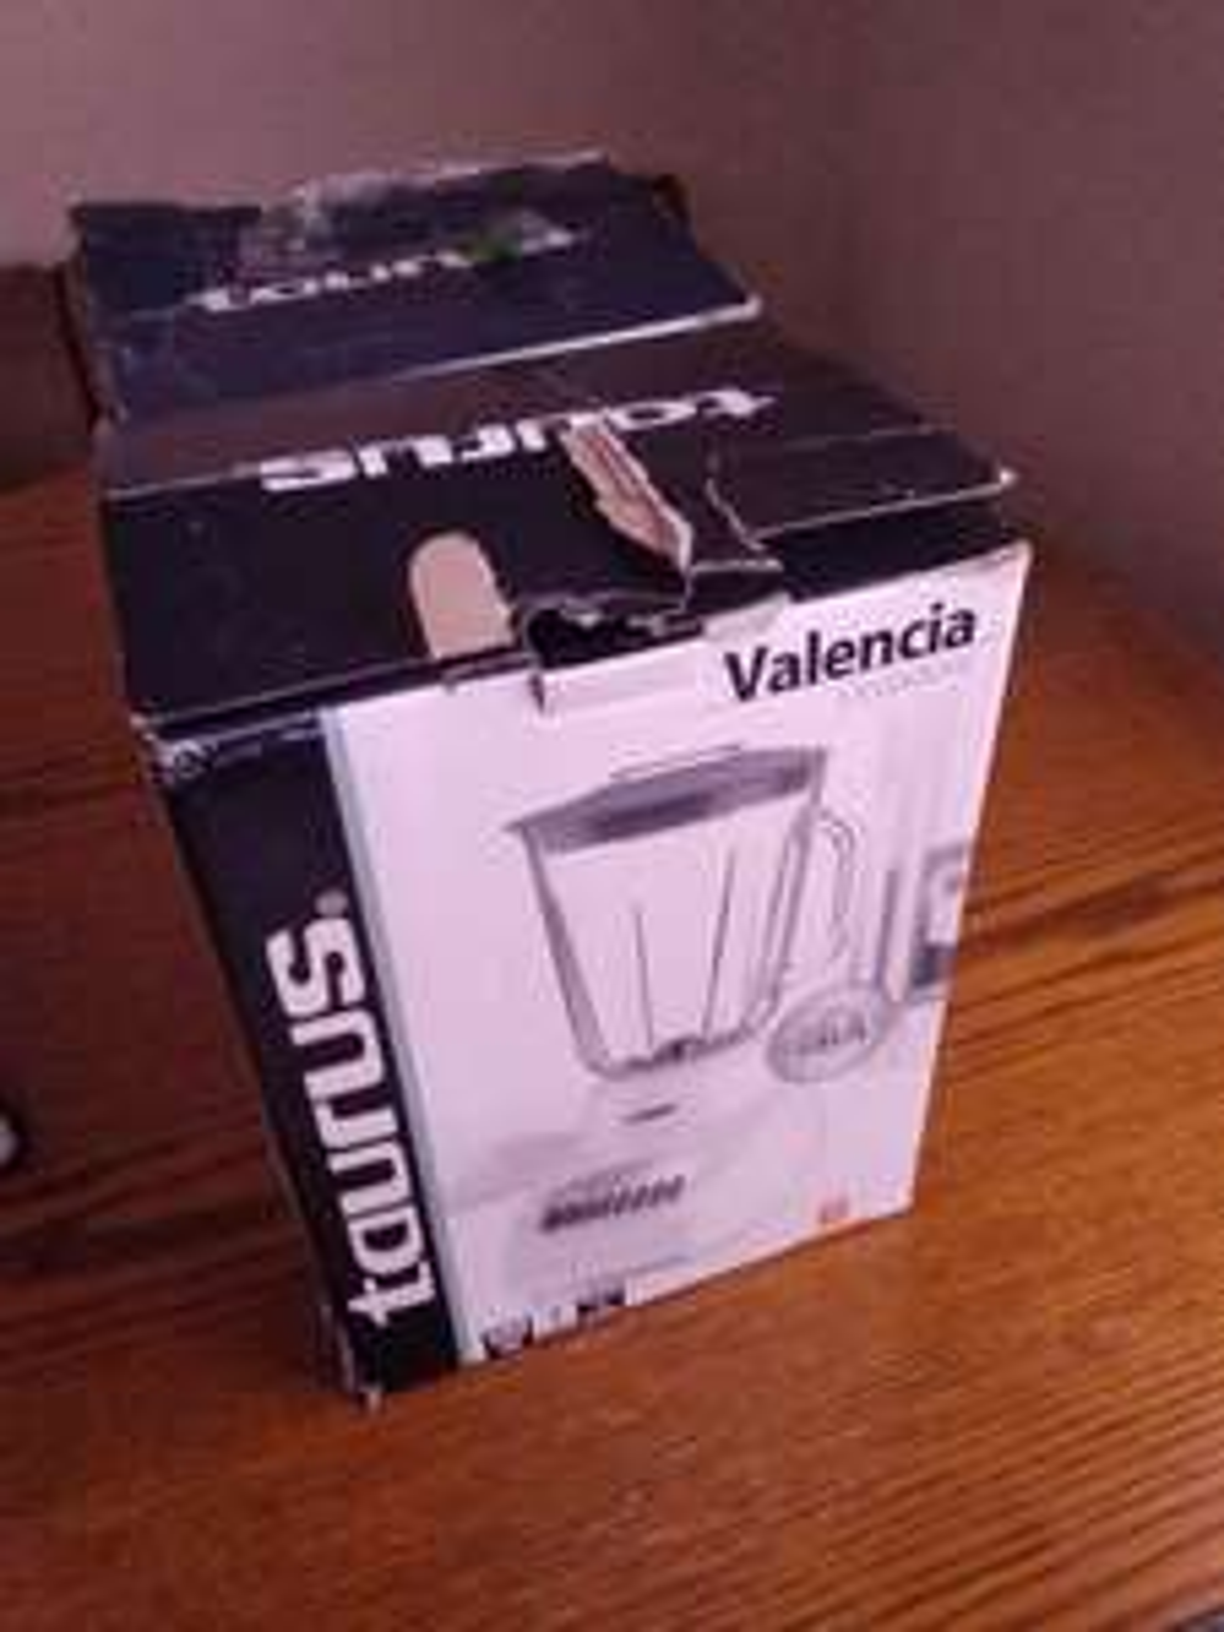 Bodega Aurrera: Licuadora Taurus Vaso de vidrio 500w 7 velocidades